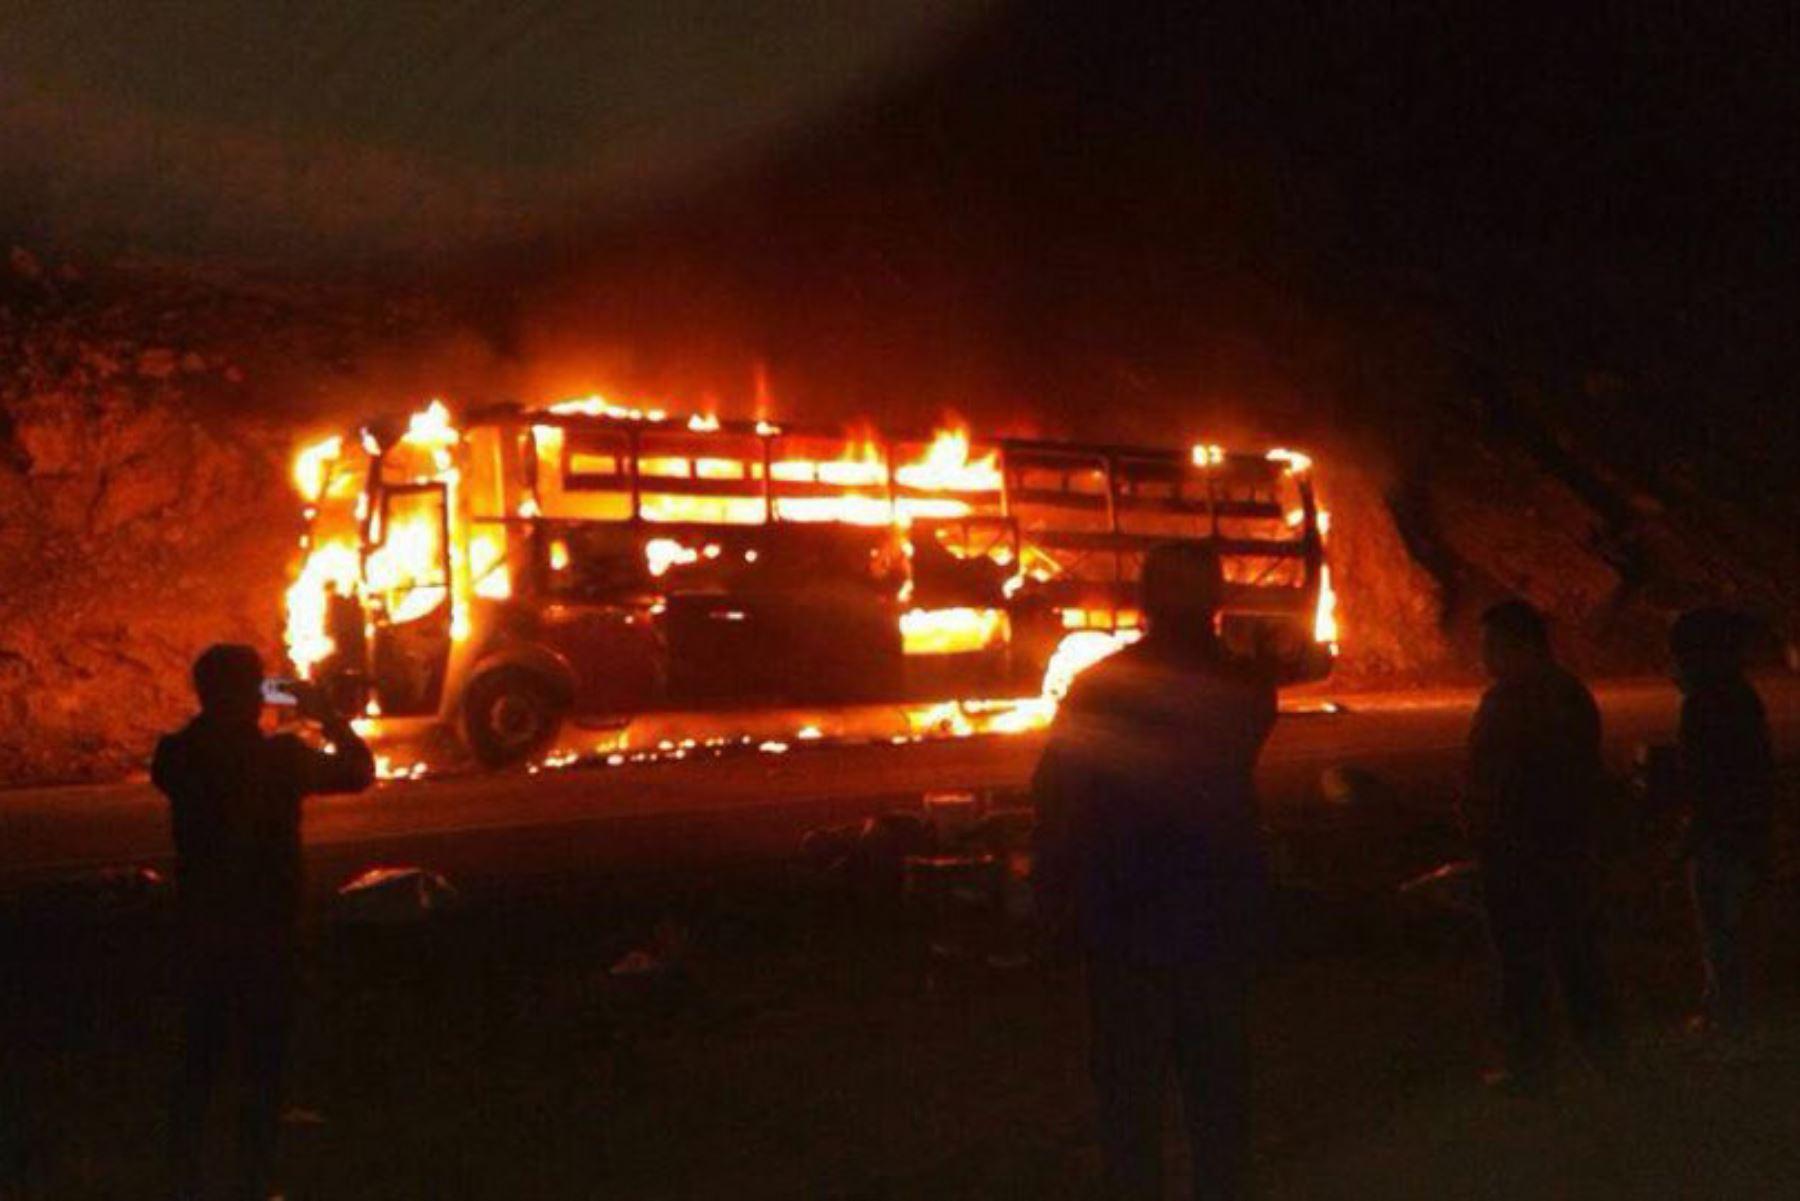 Pasajeros salvan de morir al incendiarse un ómnibus interprovincial en carretera a Huancavelica. ANDINA/Pedro Tinoco